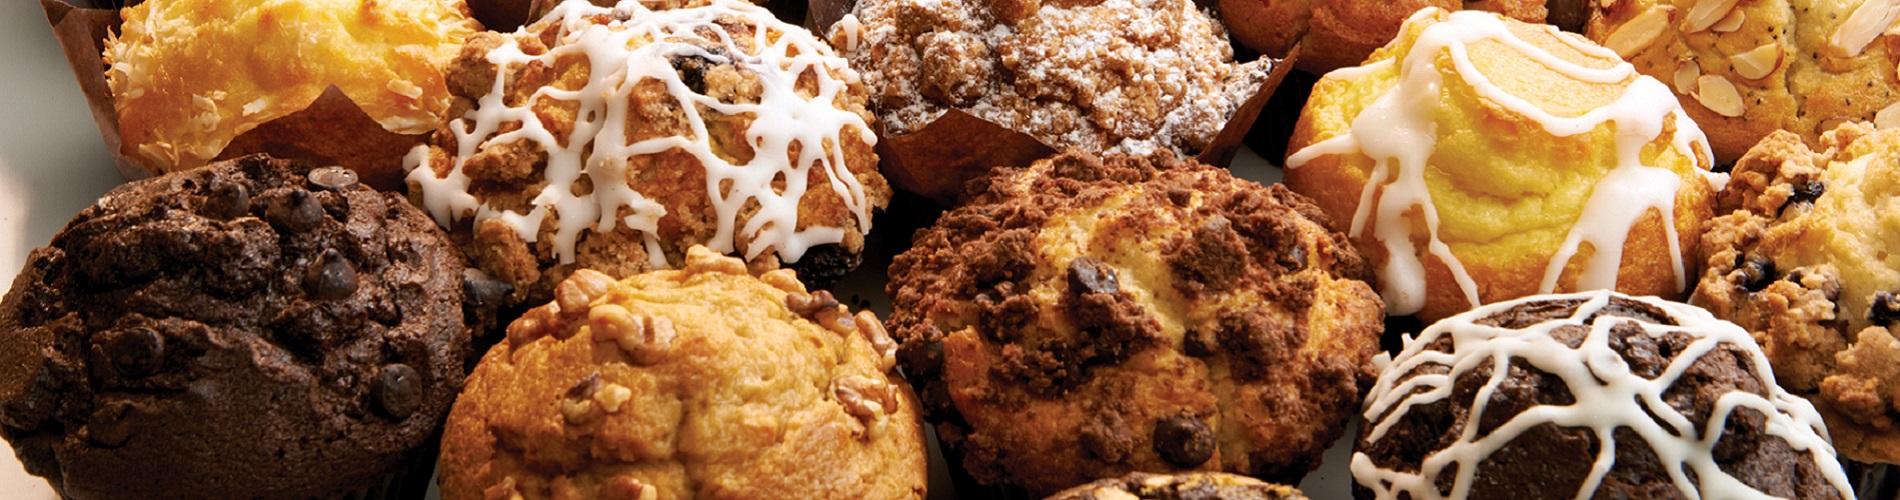 Muffins_1_003-3